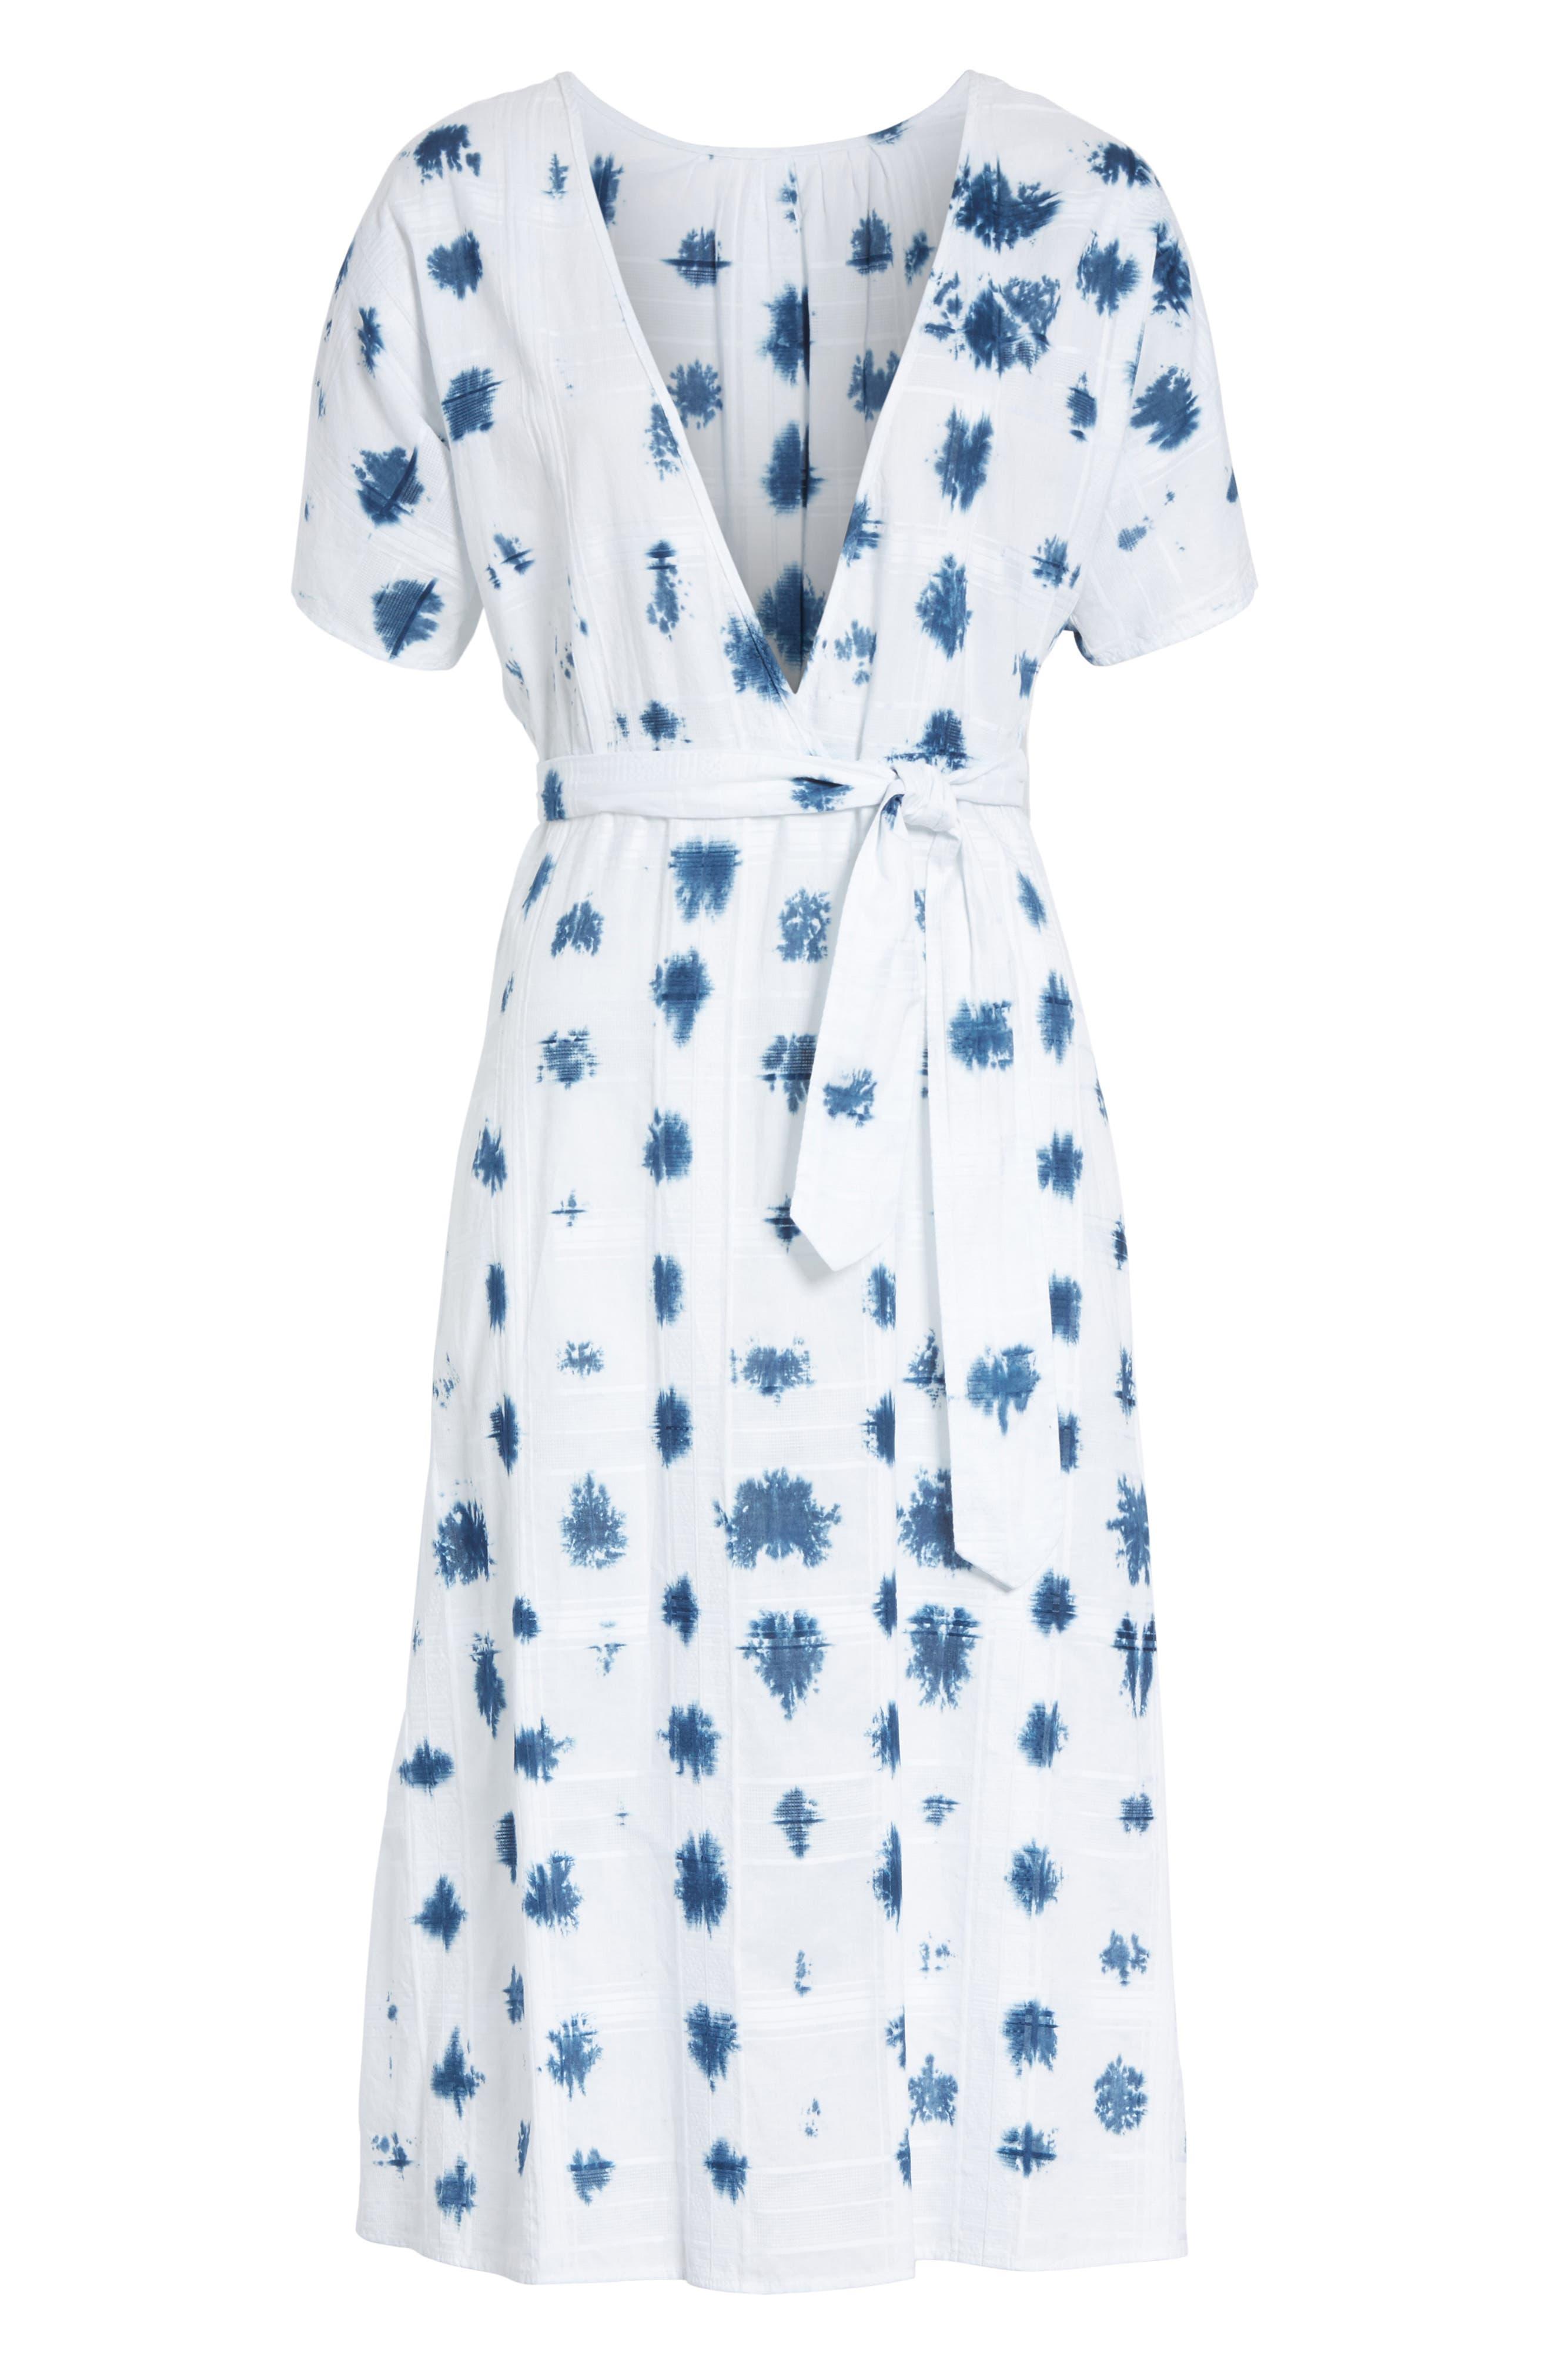 Weekend Tie Dye Dress,                             Alternate thumbnail 6, color,                             122